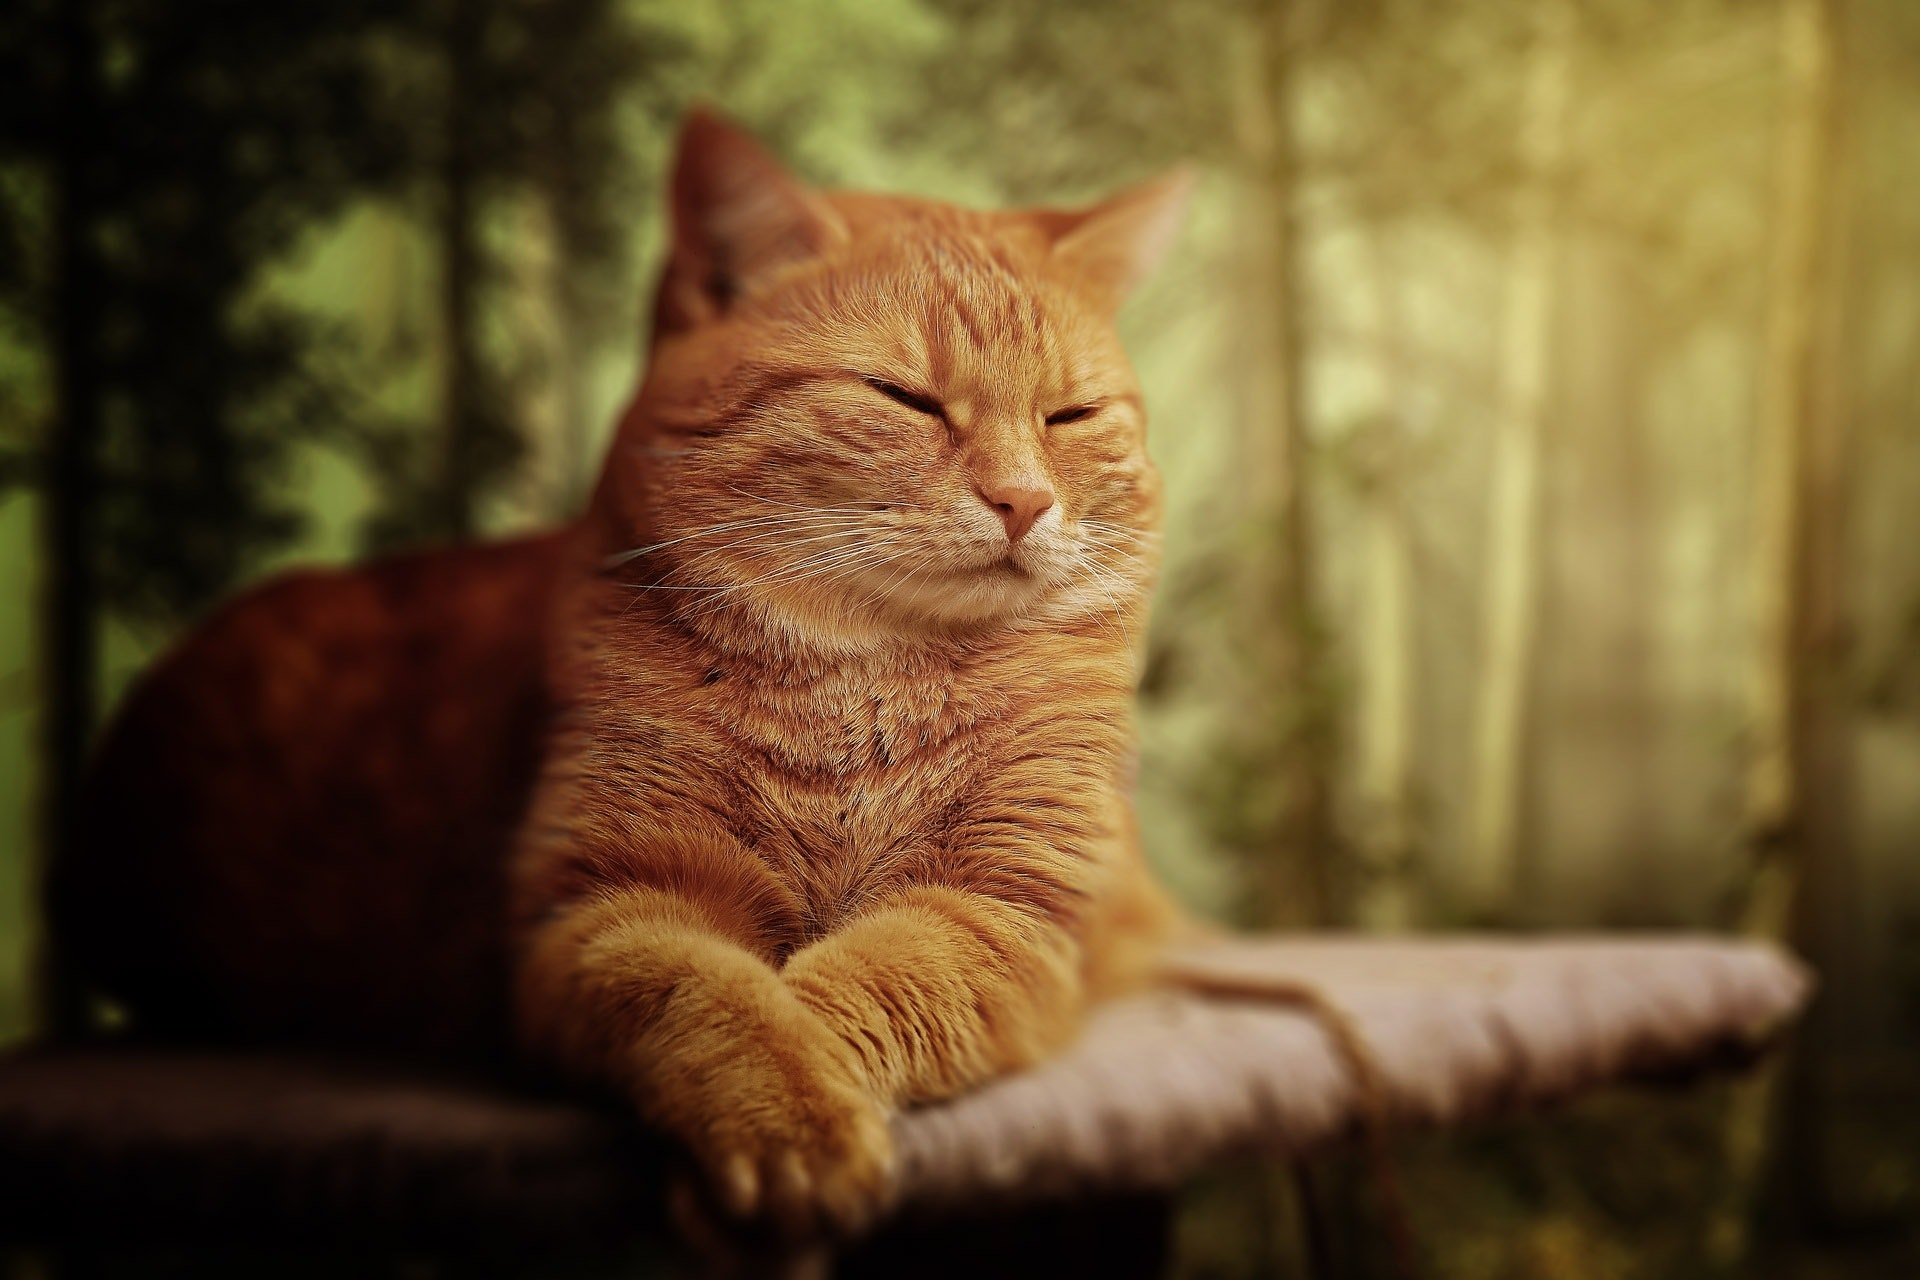 Orange Tabby Cat Laying On Brown Sofa 183 Free Stock Photo